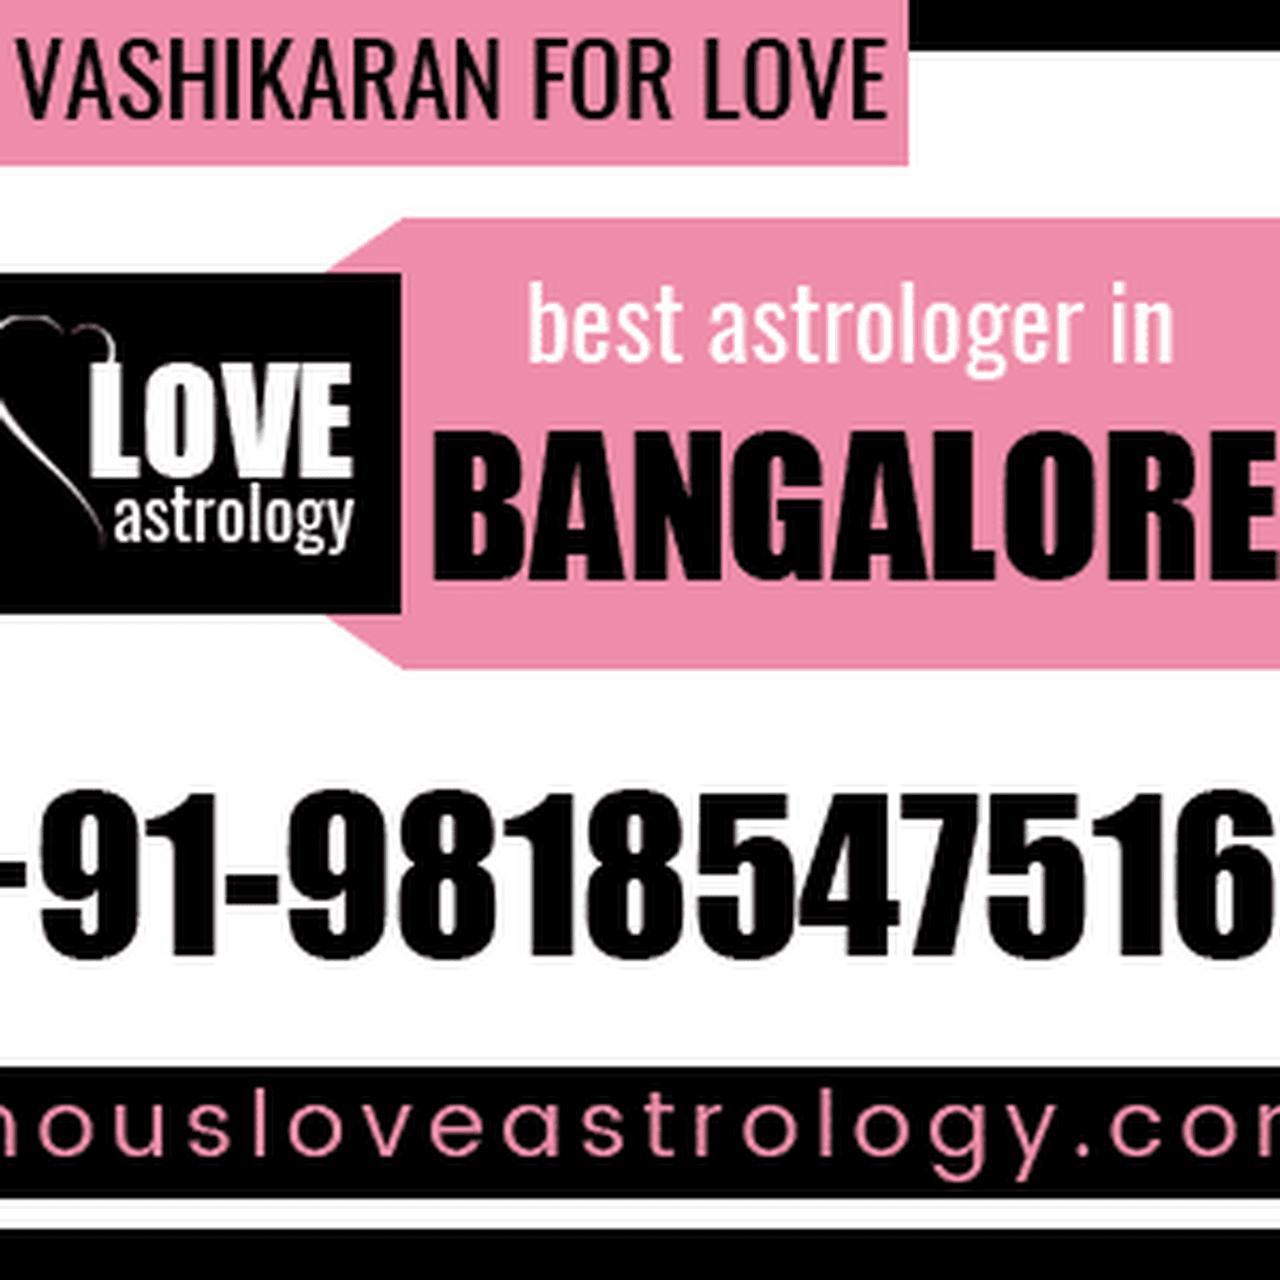 Vashikaran specialist in Bangalore - Astrologer in Bengaluru